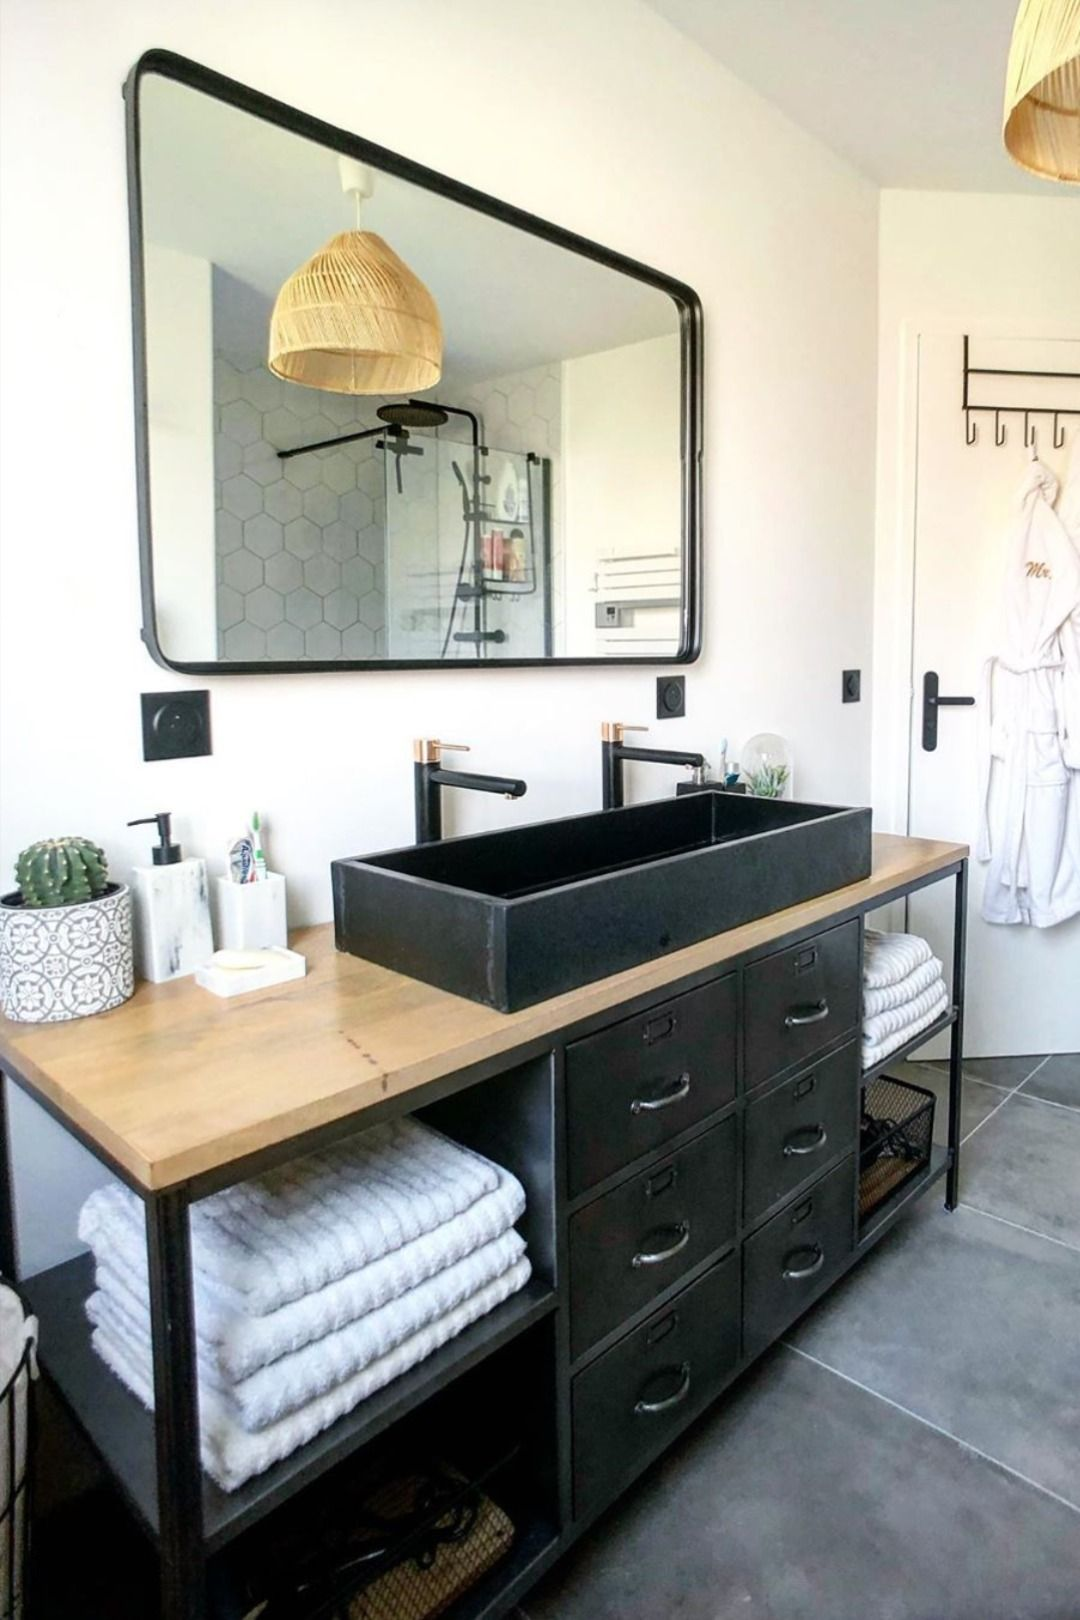 Meuble salle de bain industriel   Idée salle de bain, Meubles ...